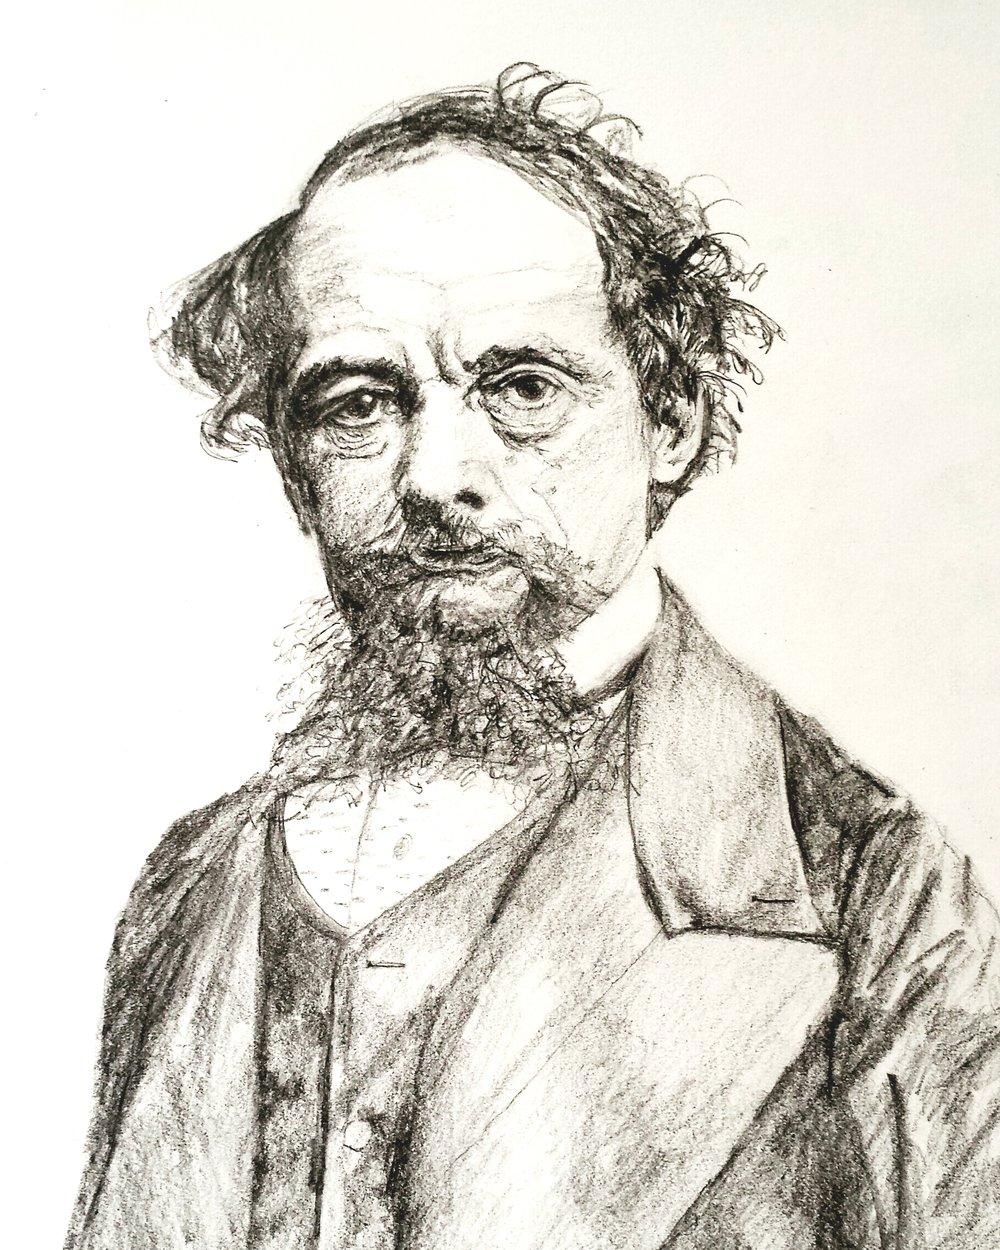 Charles Dickens, graphite, 2016